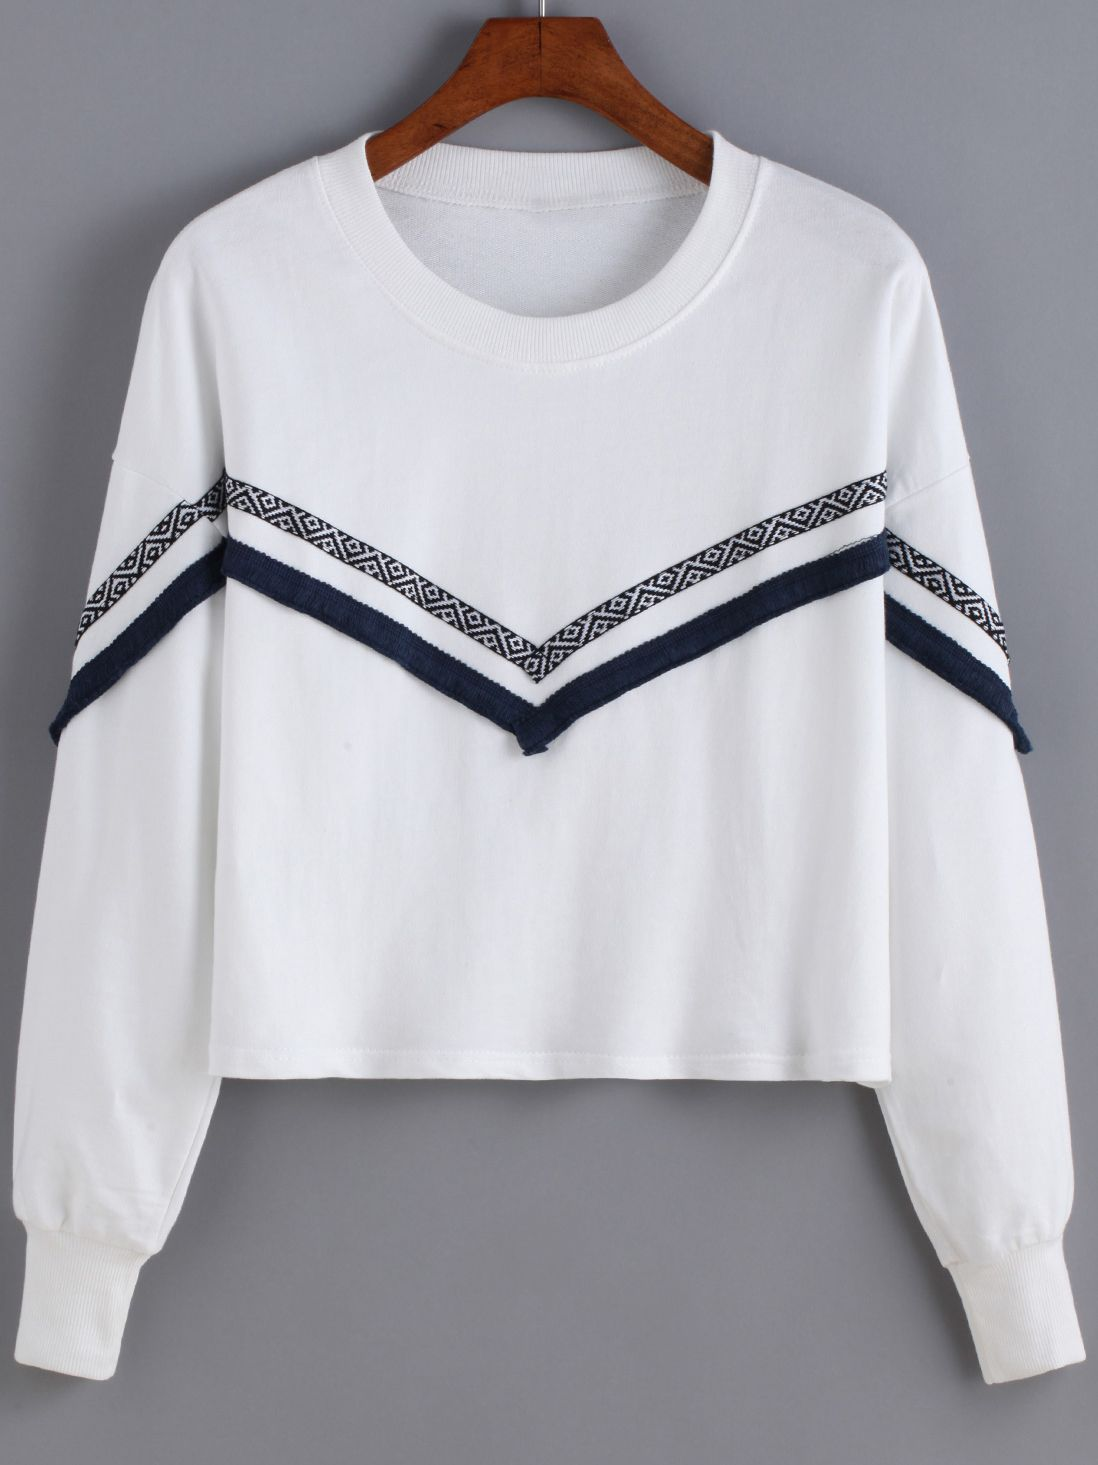 Shop White Round Neck Tribal Print Sweatshirt online. SheIn offers White Round Neck Tribal Print Sweatshirt & more to fit your fashionable needs.